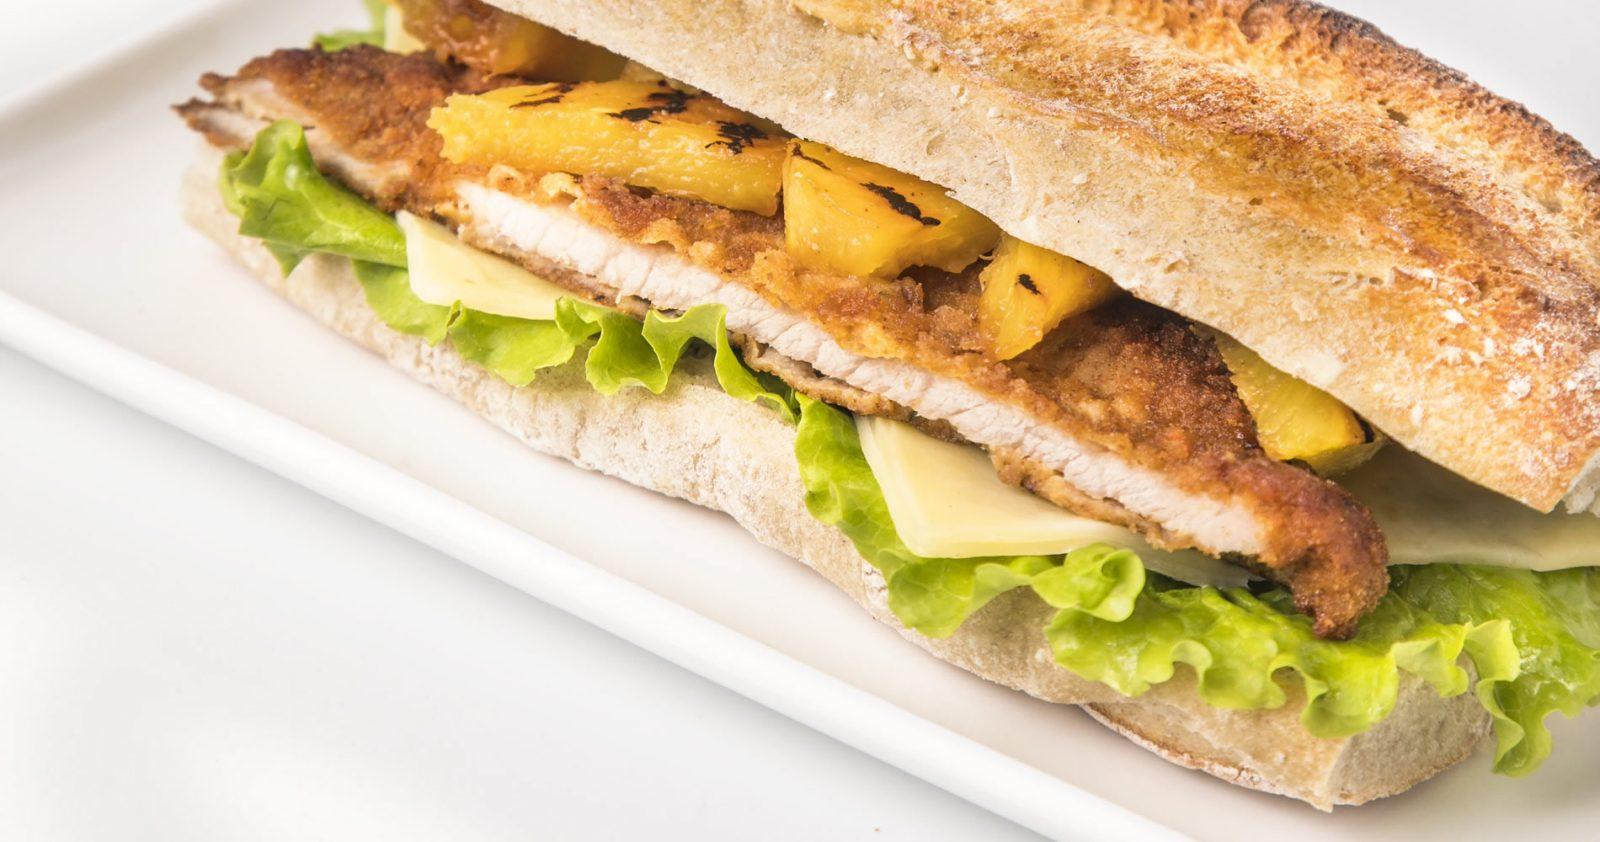 Club Sandwich De Bola De Pierna De Cerdo